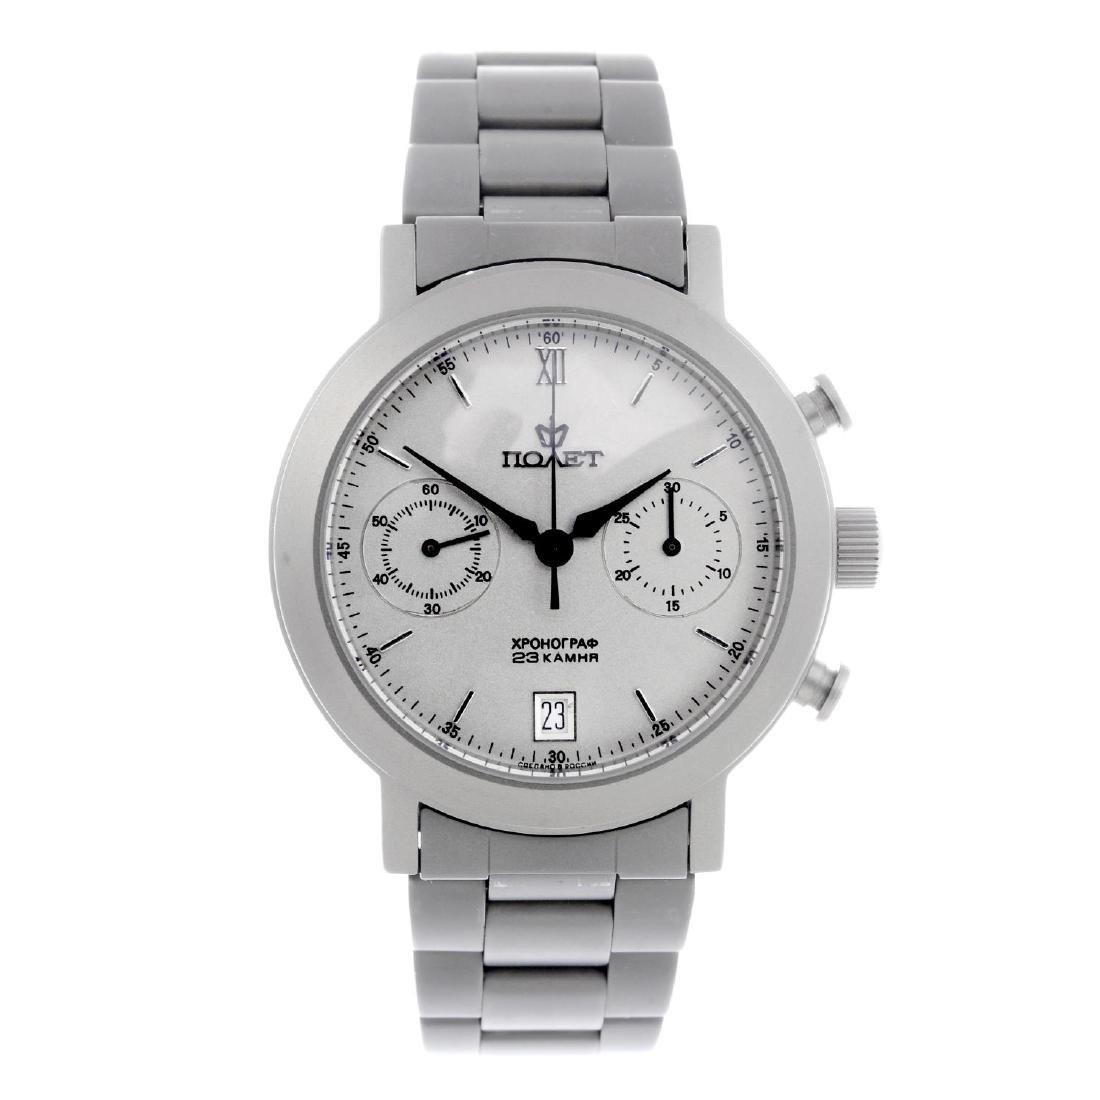 POLJOT - a gentleman's chronograph bracelet watch.